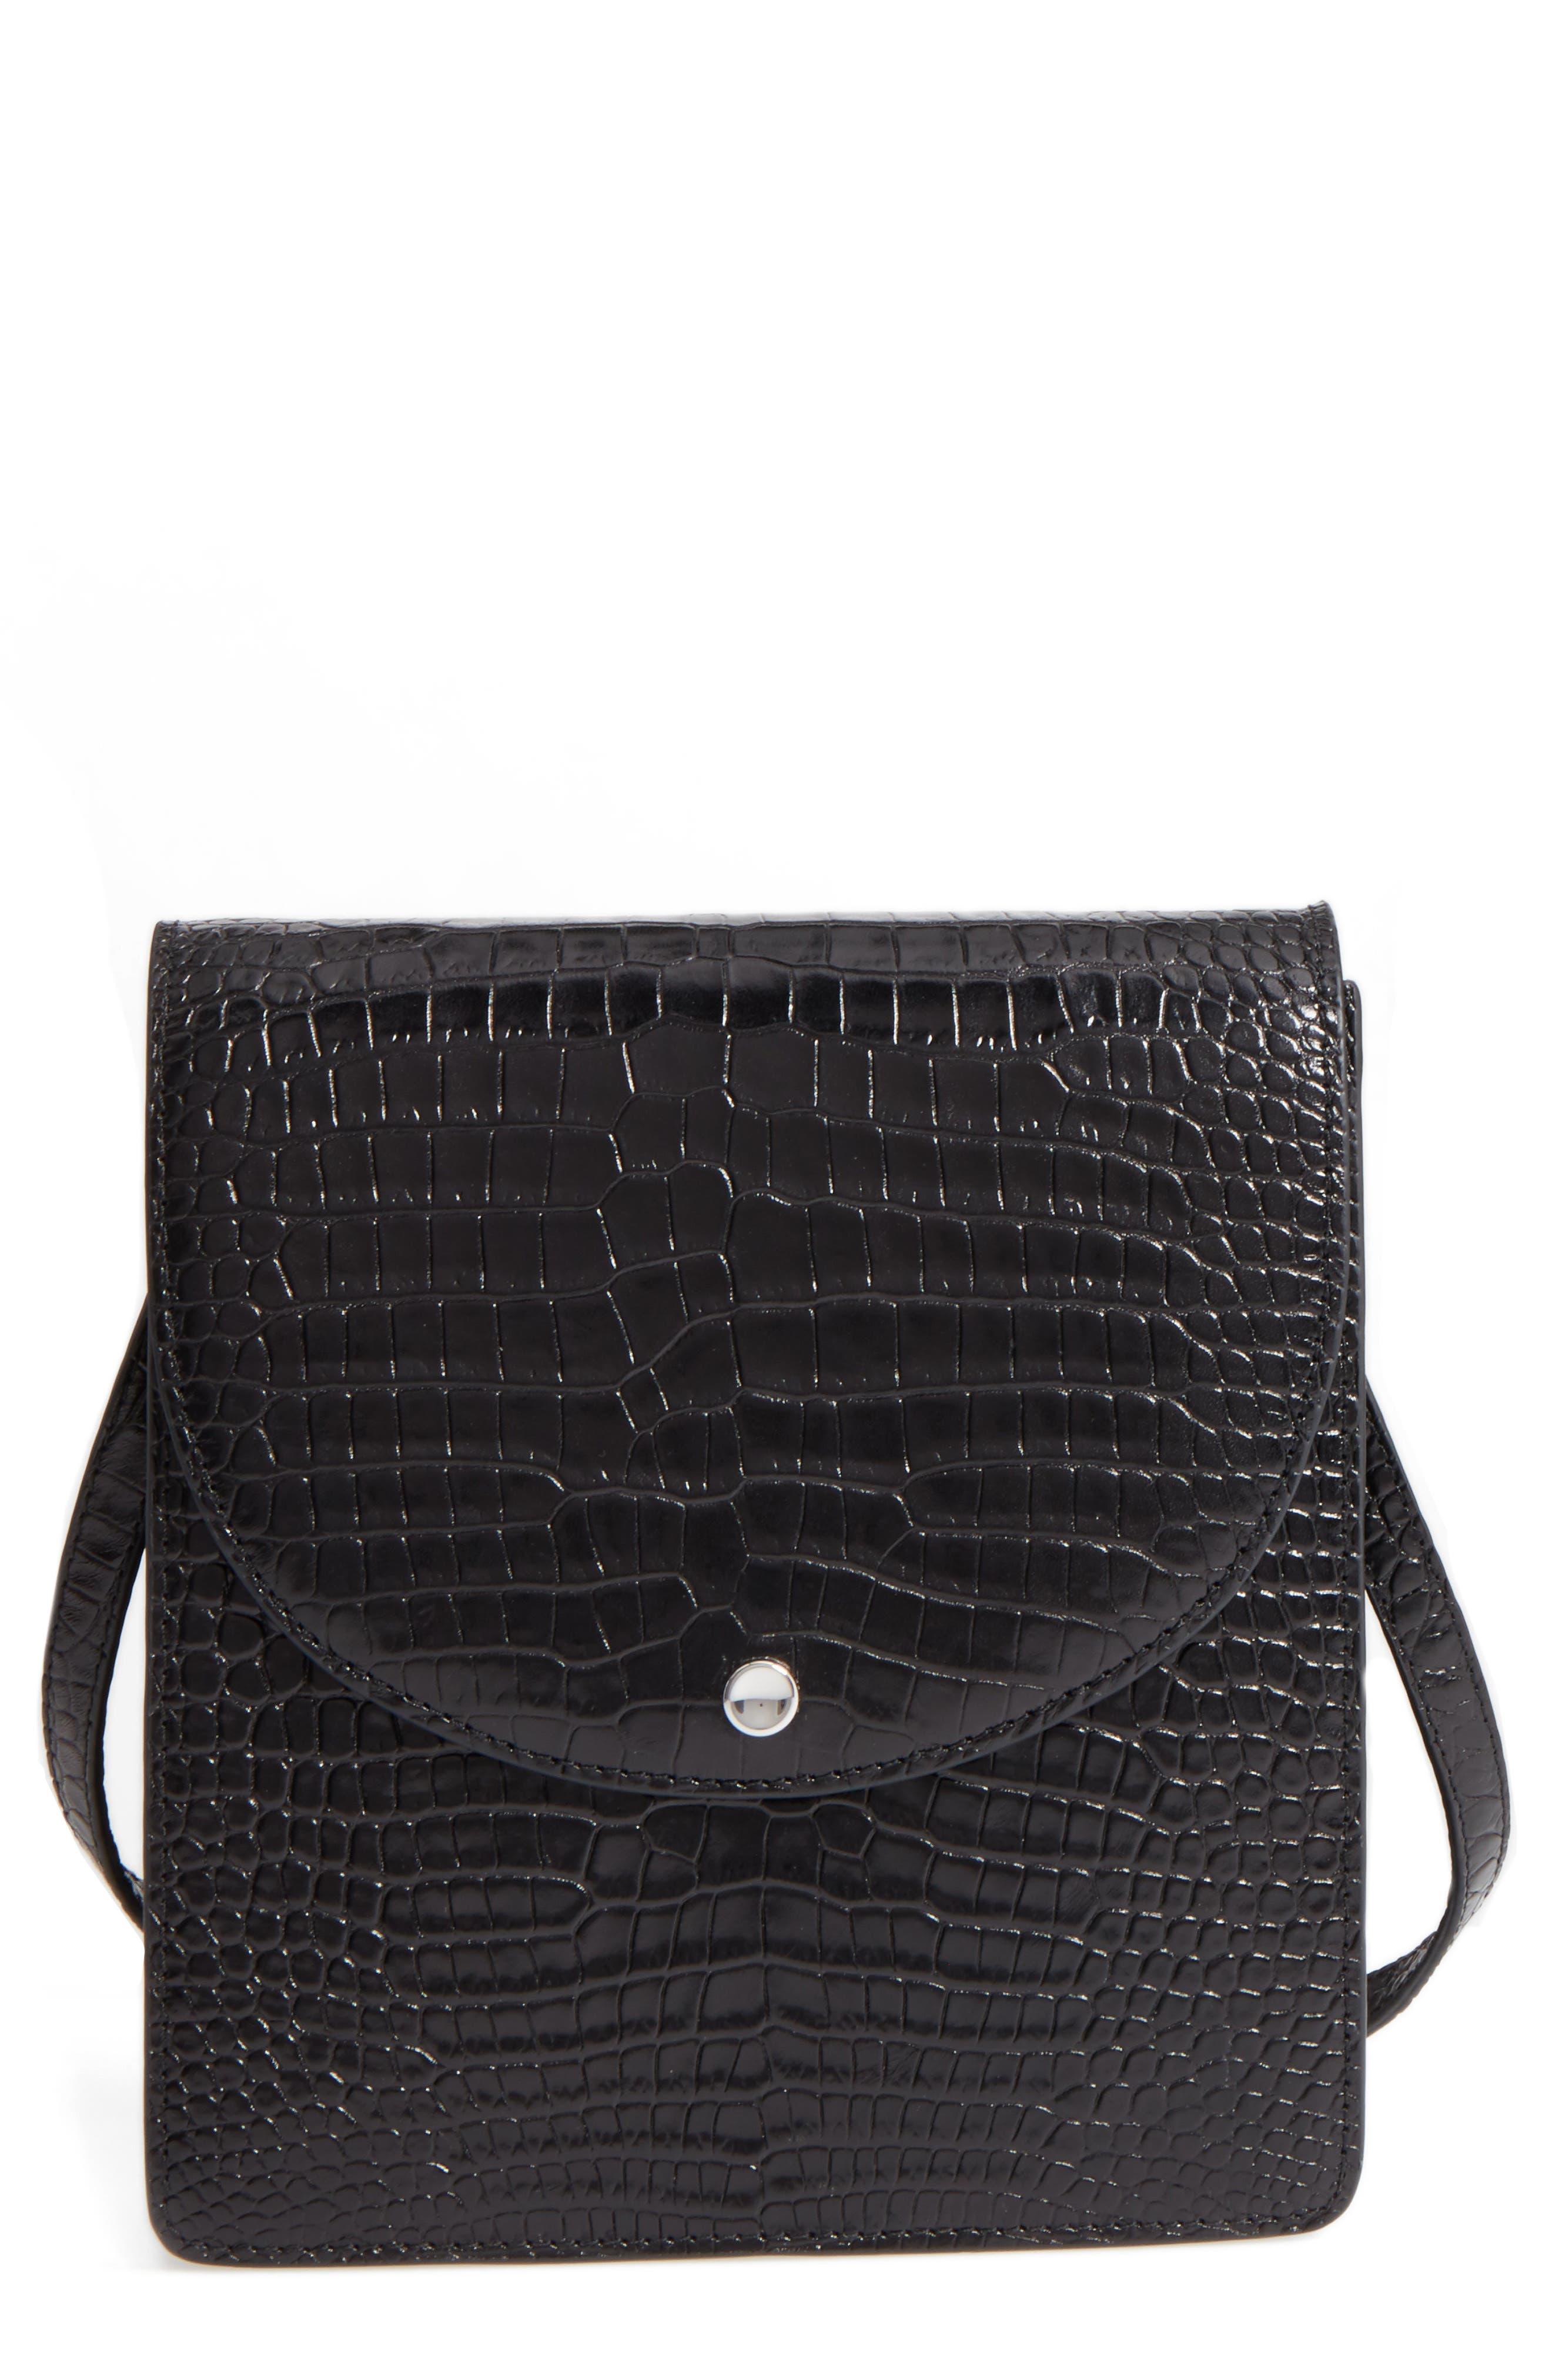 Eloise Leather Crossbody Bag,                             Main thumbnail 1, color,                             001